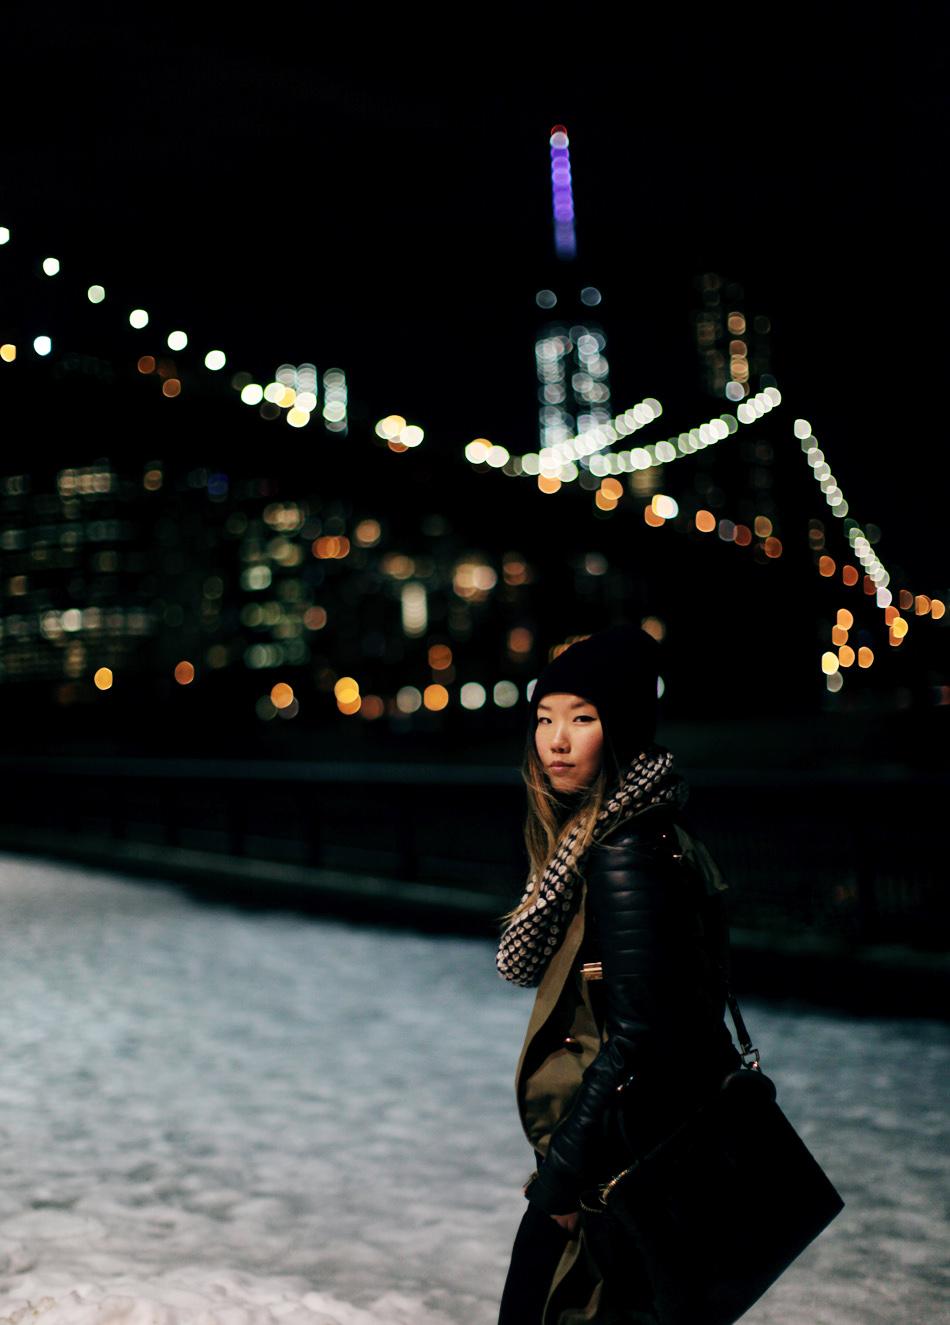 Downtown Manhattan Brooklyn Bridge Park